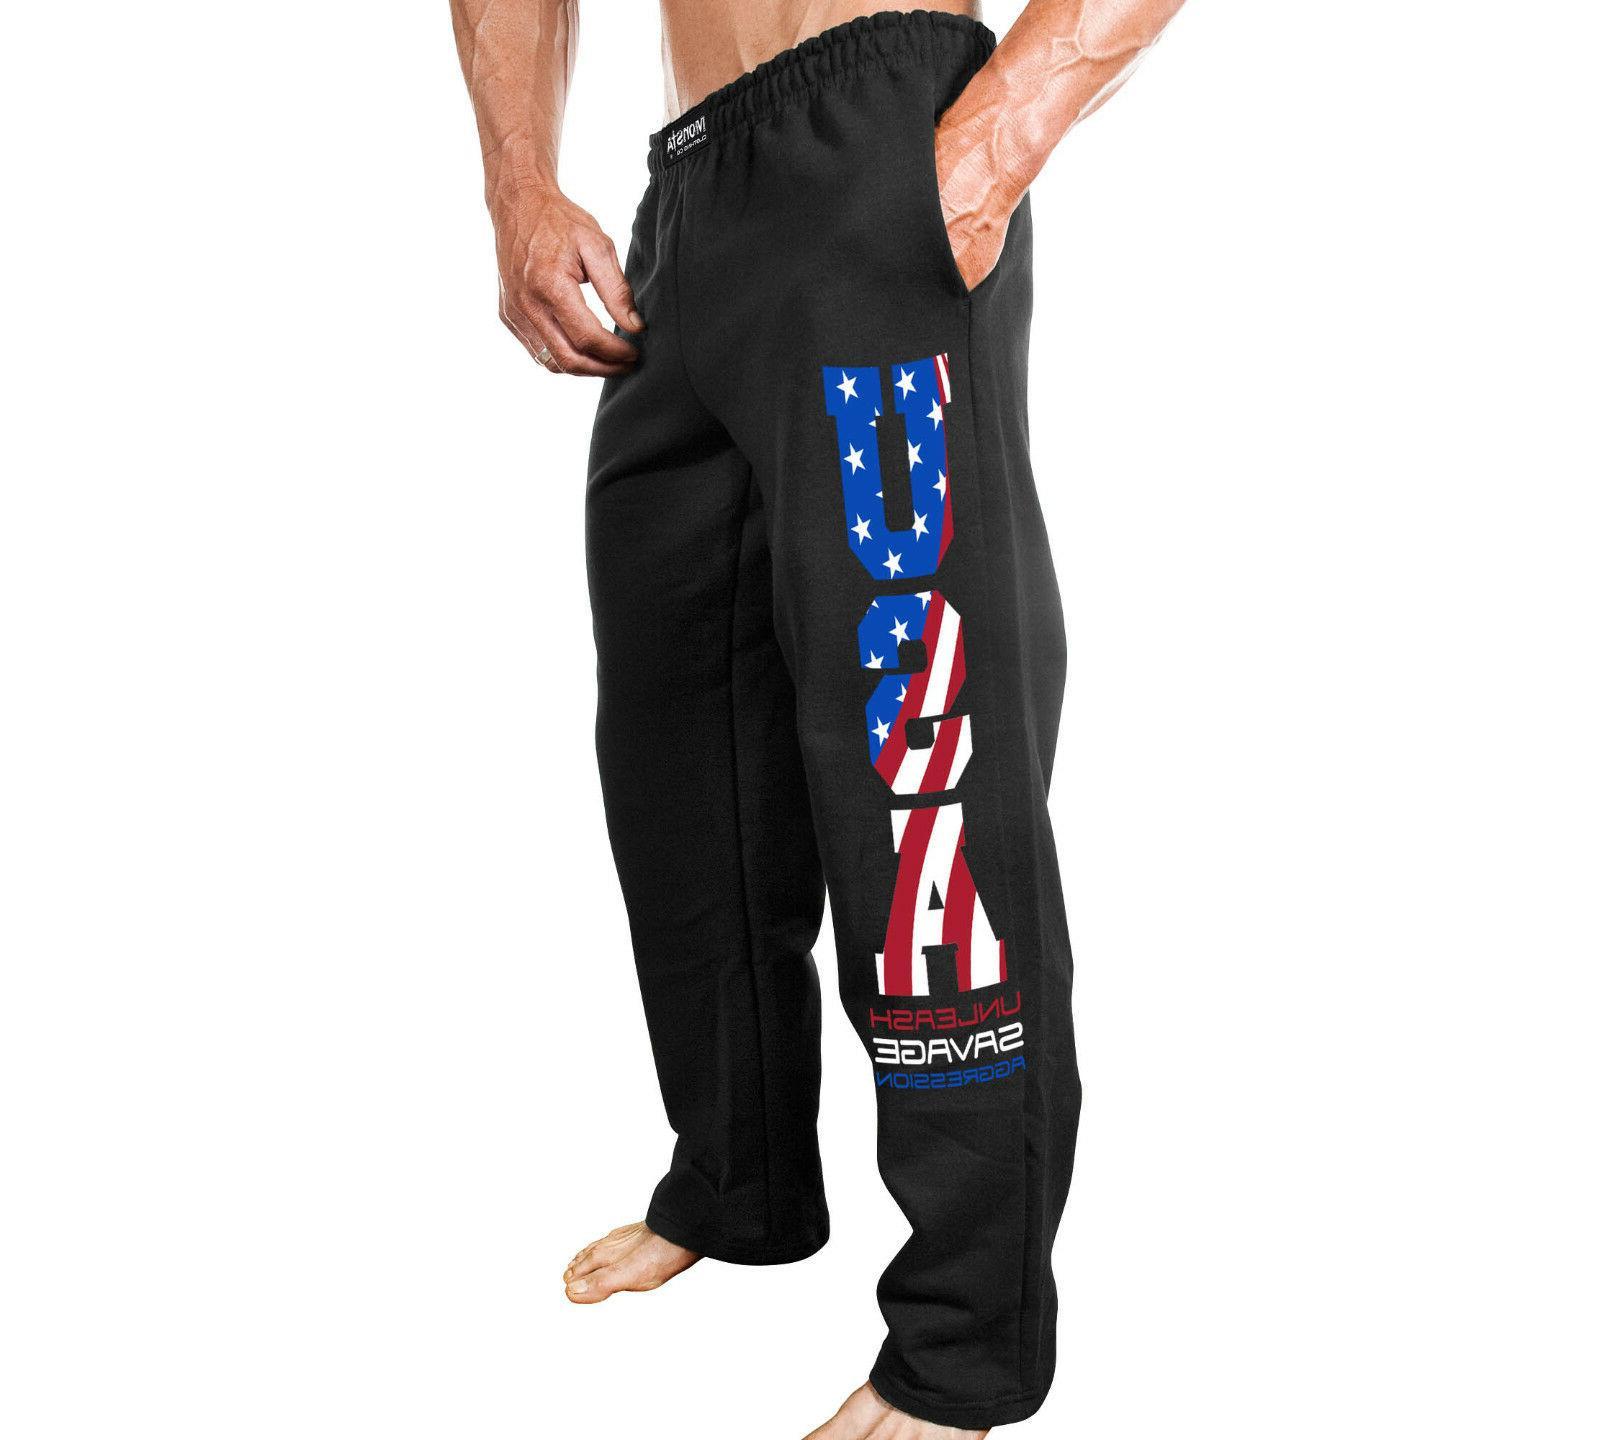 new men s fitness gym sweatpants usa